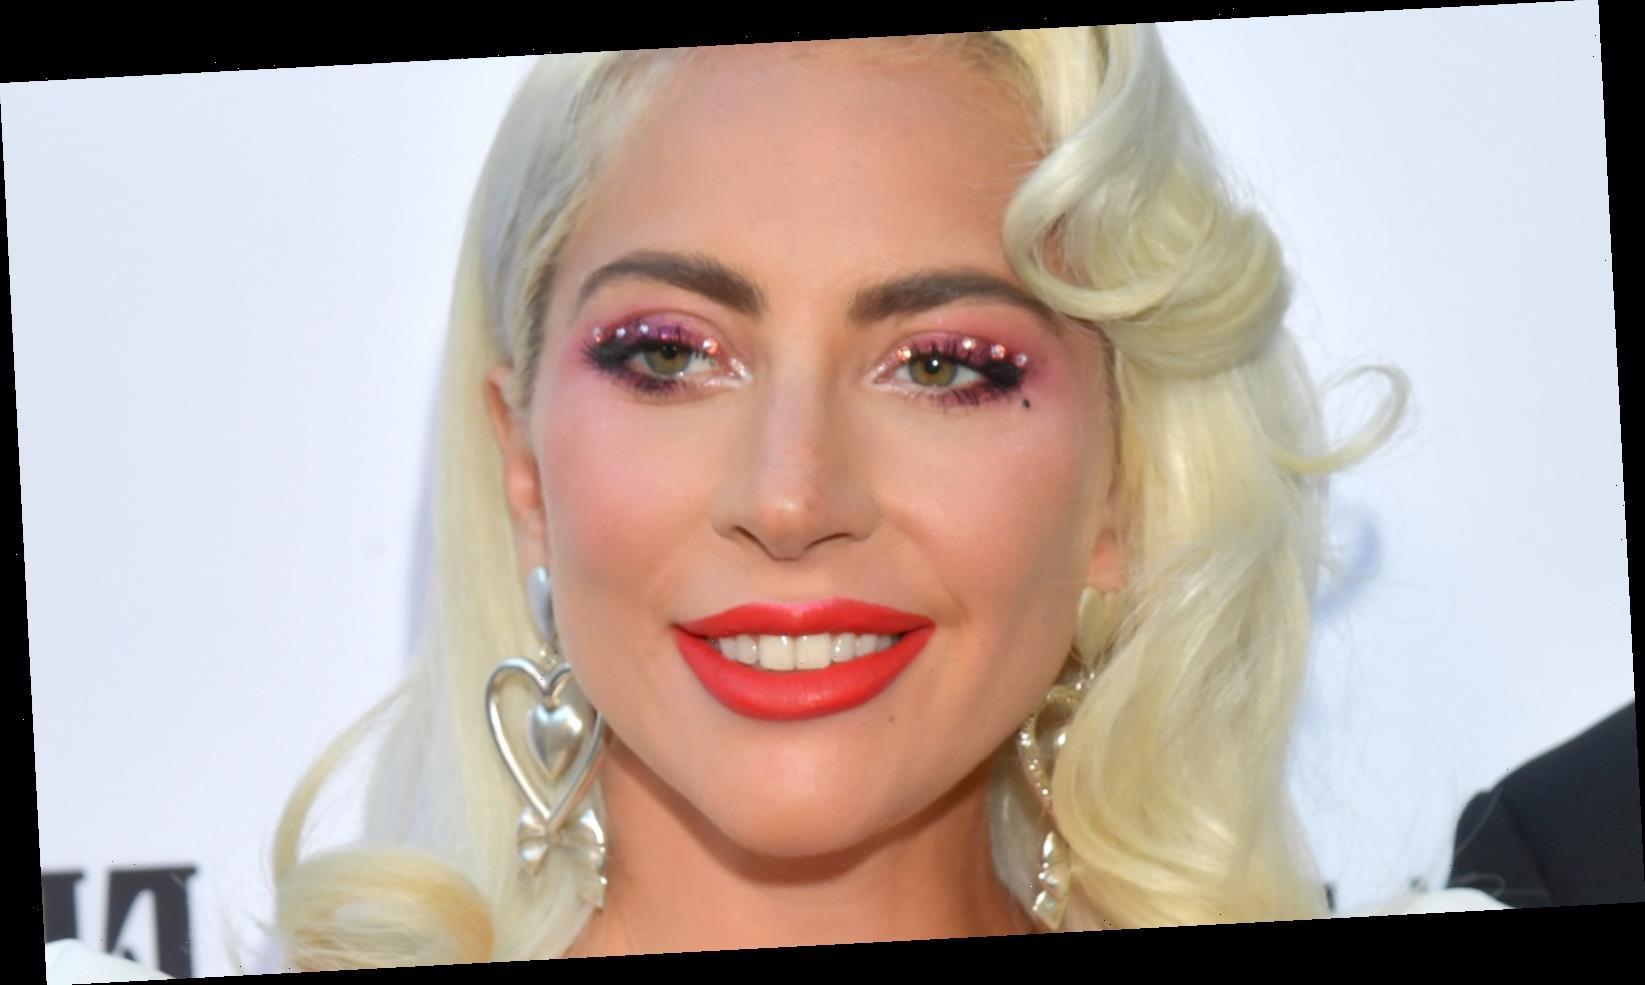 Lady Gaga's Stolen French Bulldogs Returned Unharmed